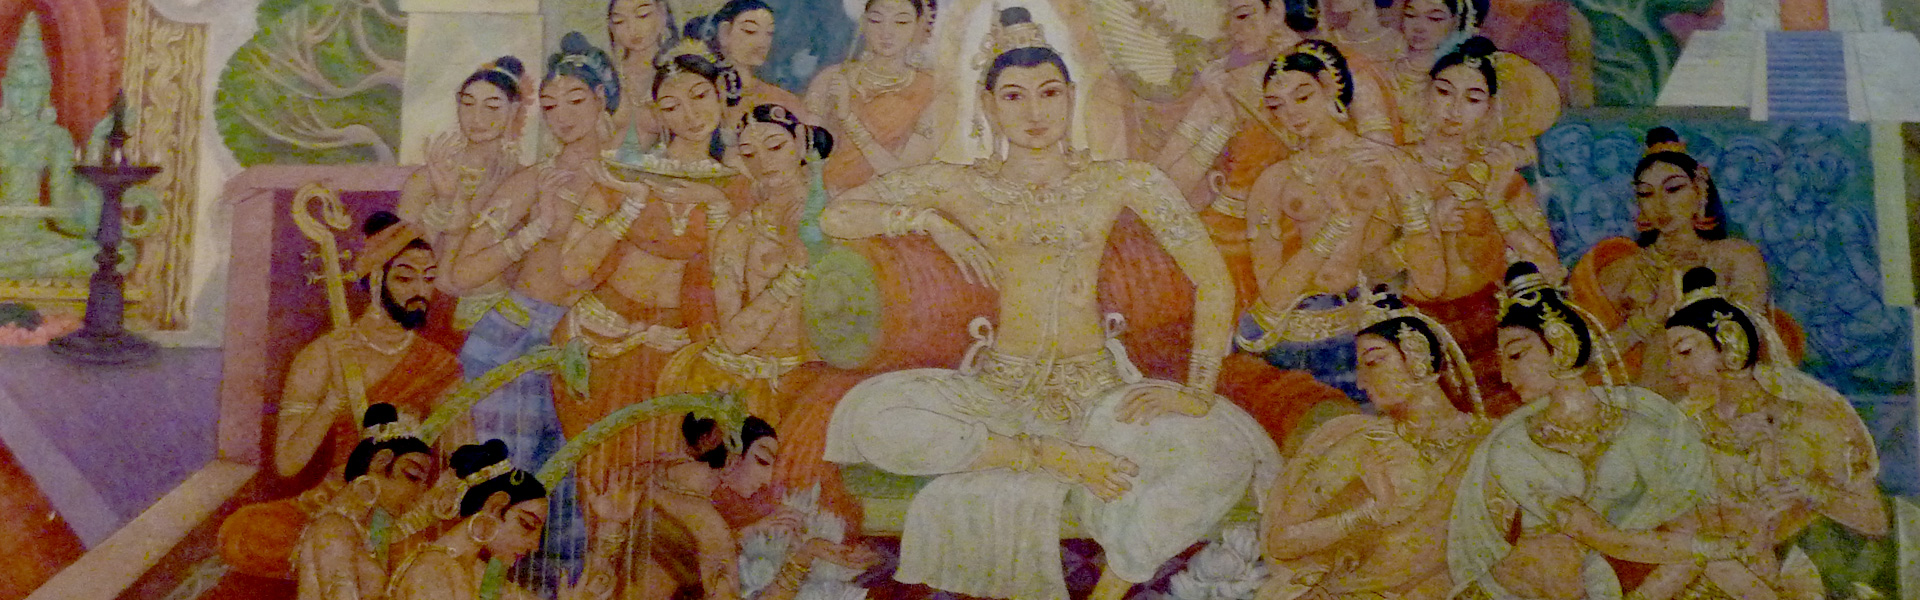 Bellanwila Rajamaha Vihara - Banner 3